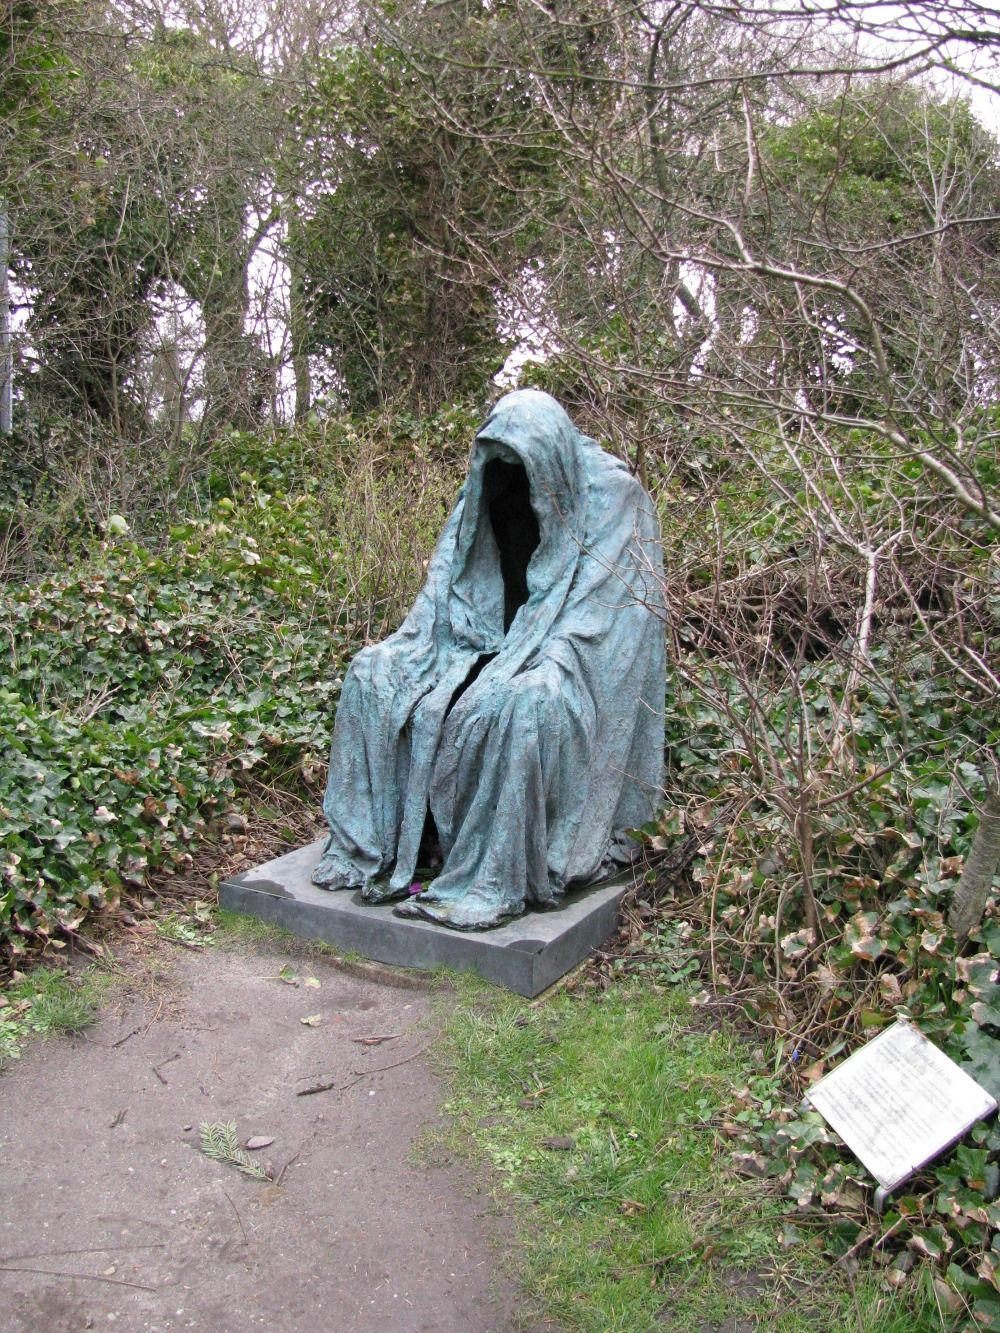 grim reaper cemetery sculpture | Cemetery Photos | Pinterest